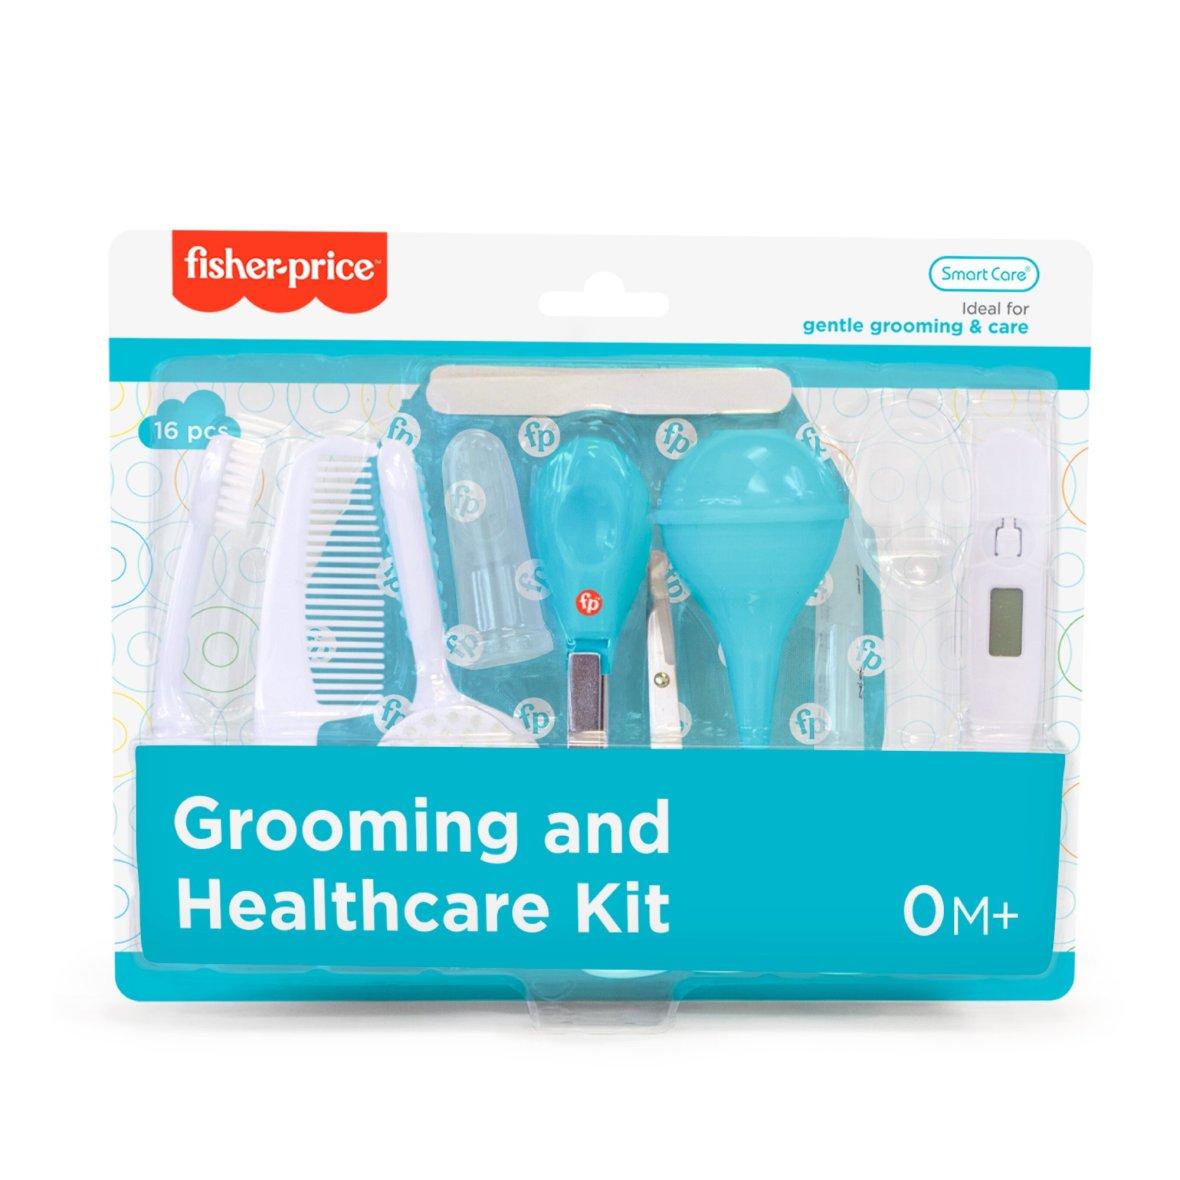 Fisherprice 16pc Grooming & Healthcare Set